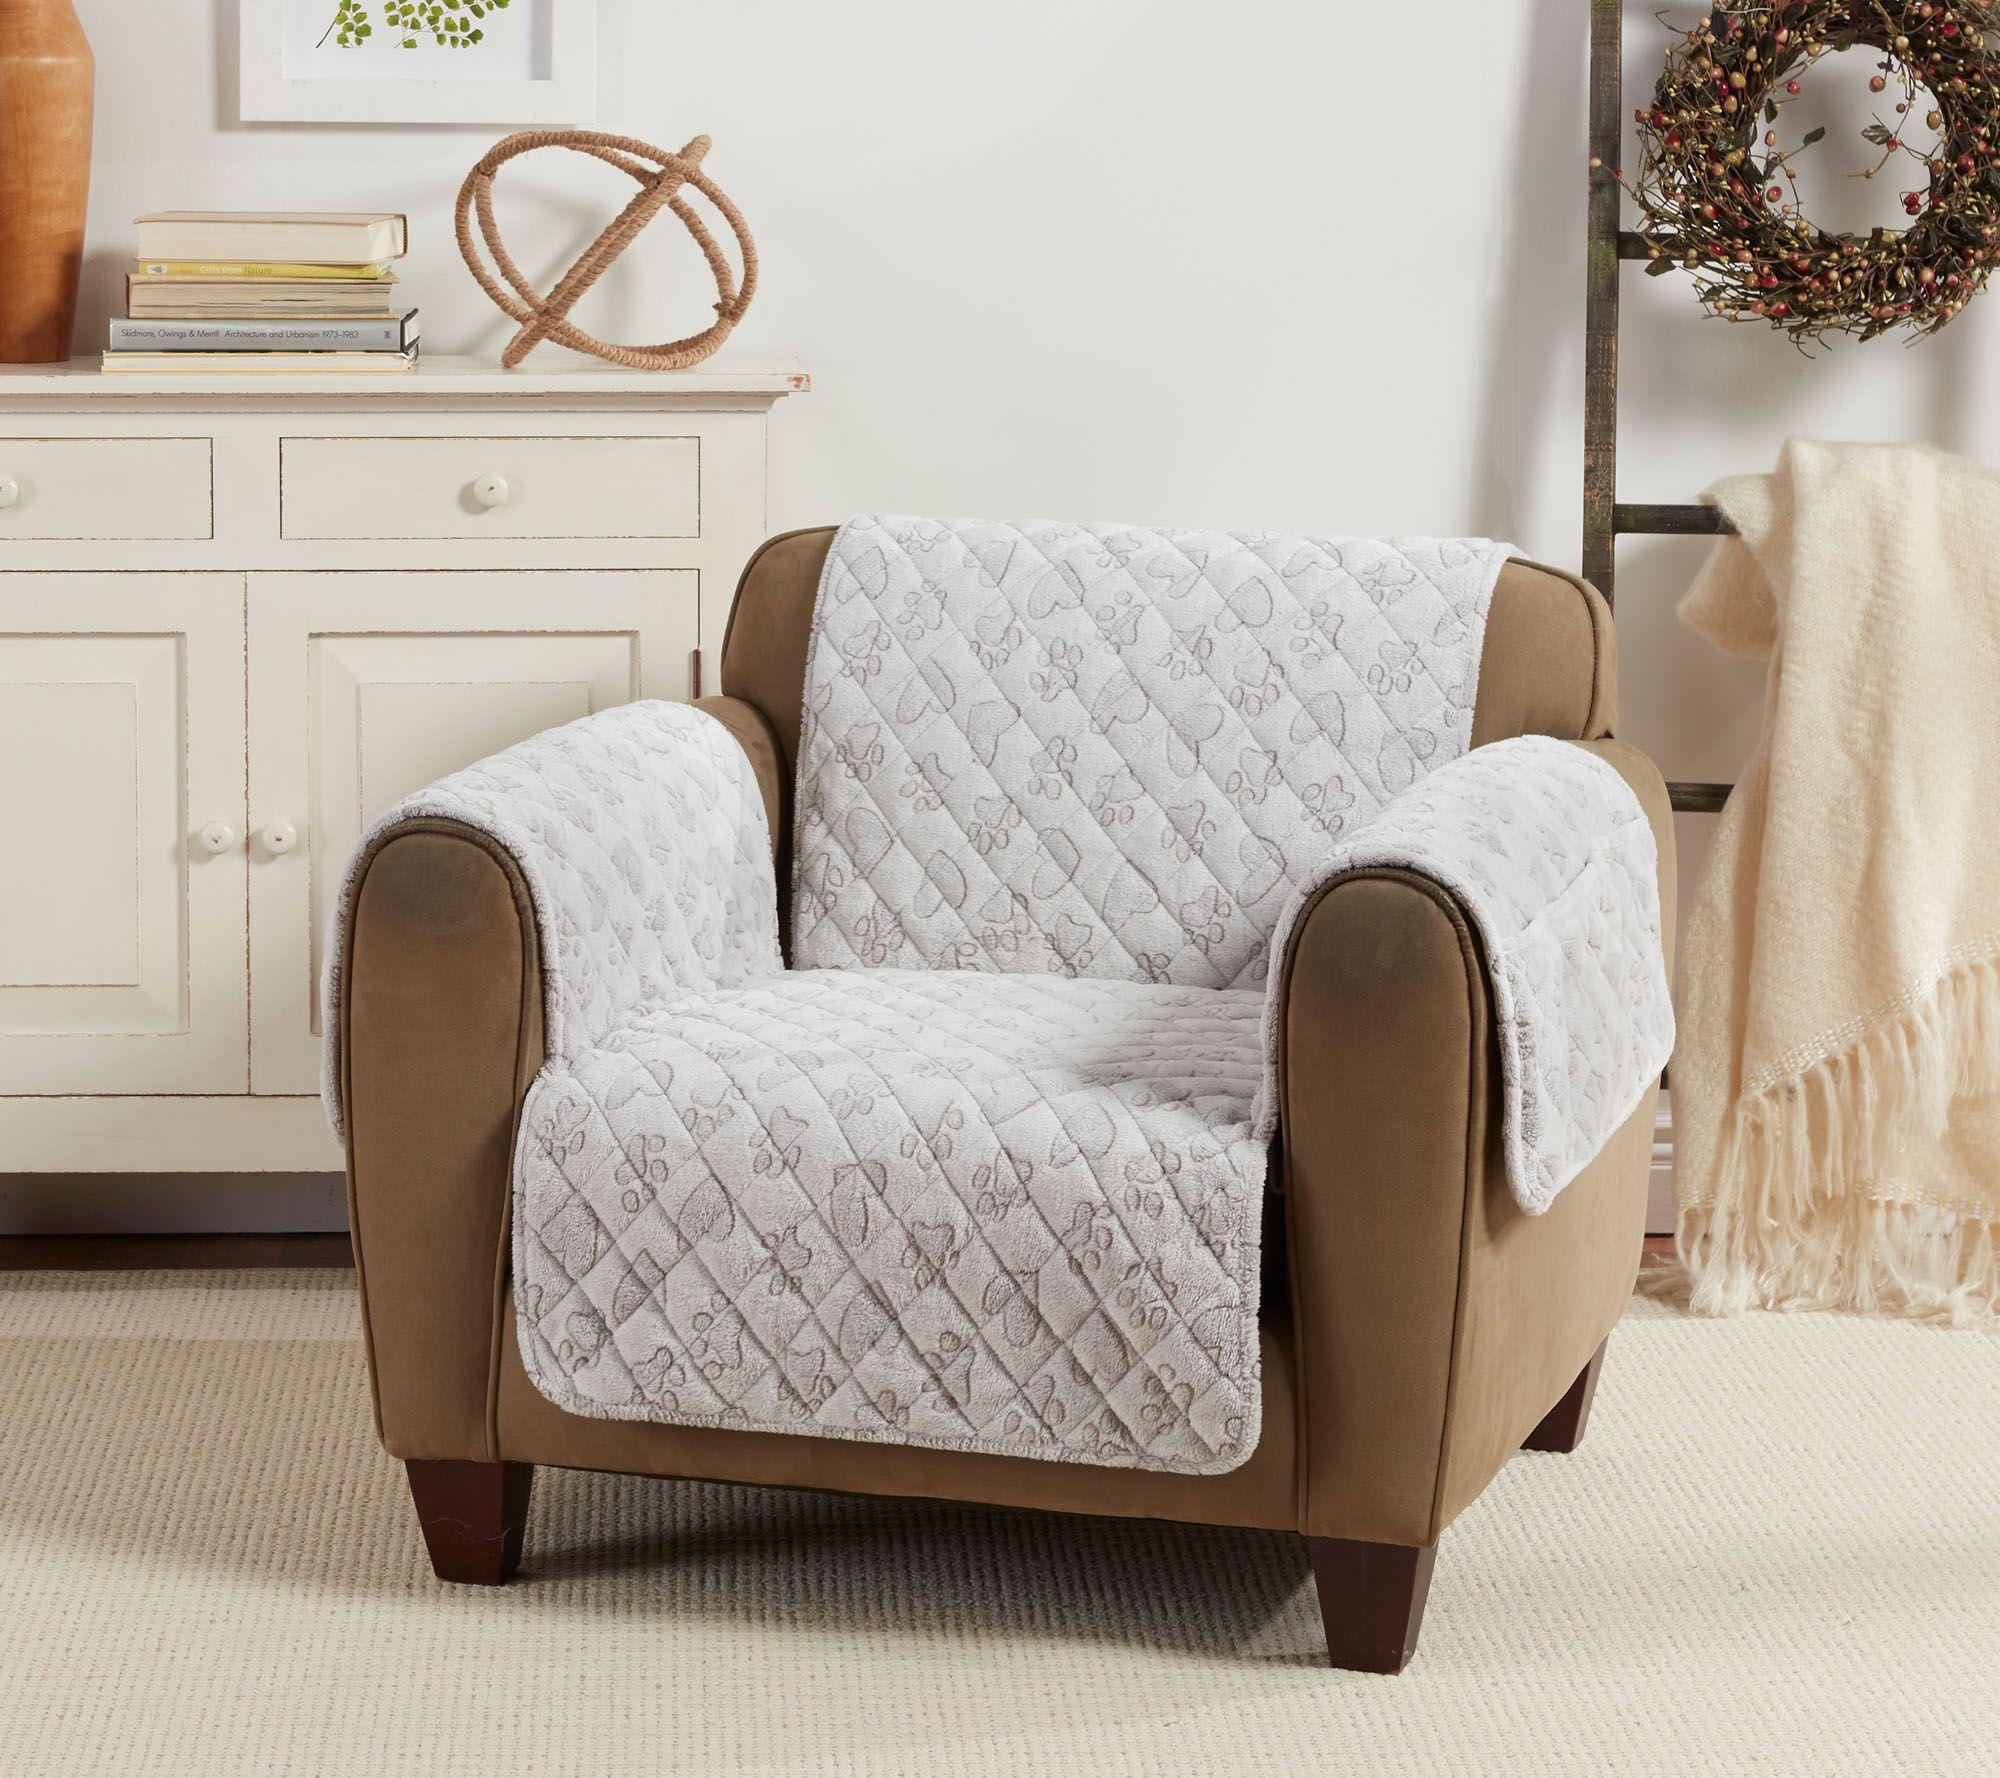 Outstanding Surefit Plush Quilted Pet Love Chair Furniture Cover Qvc Com Machost Co Dining Chair Design Ideas Machostcouk